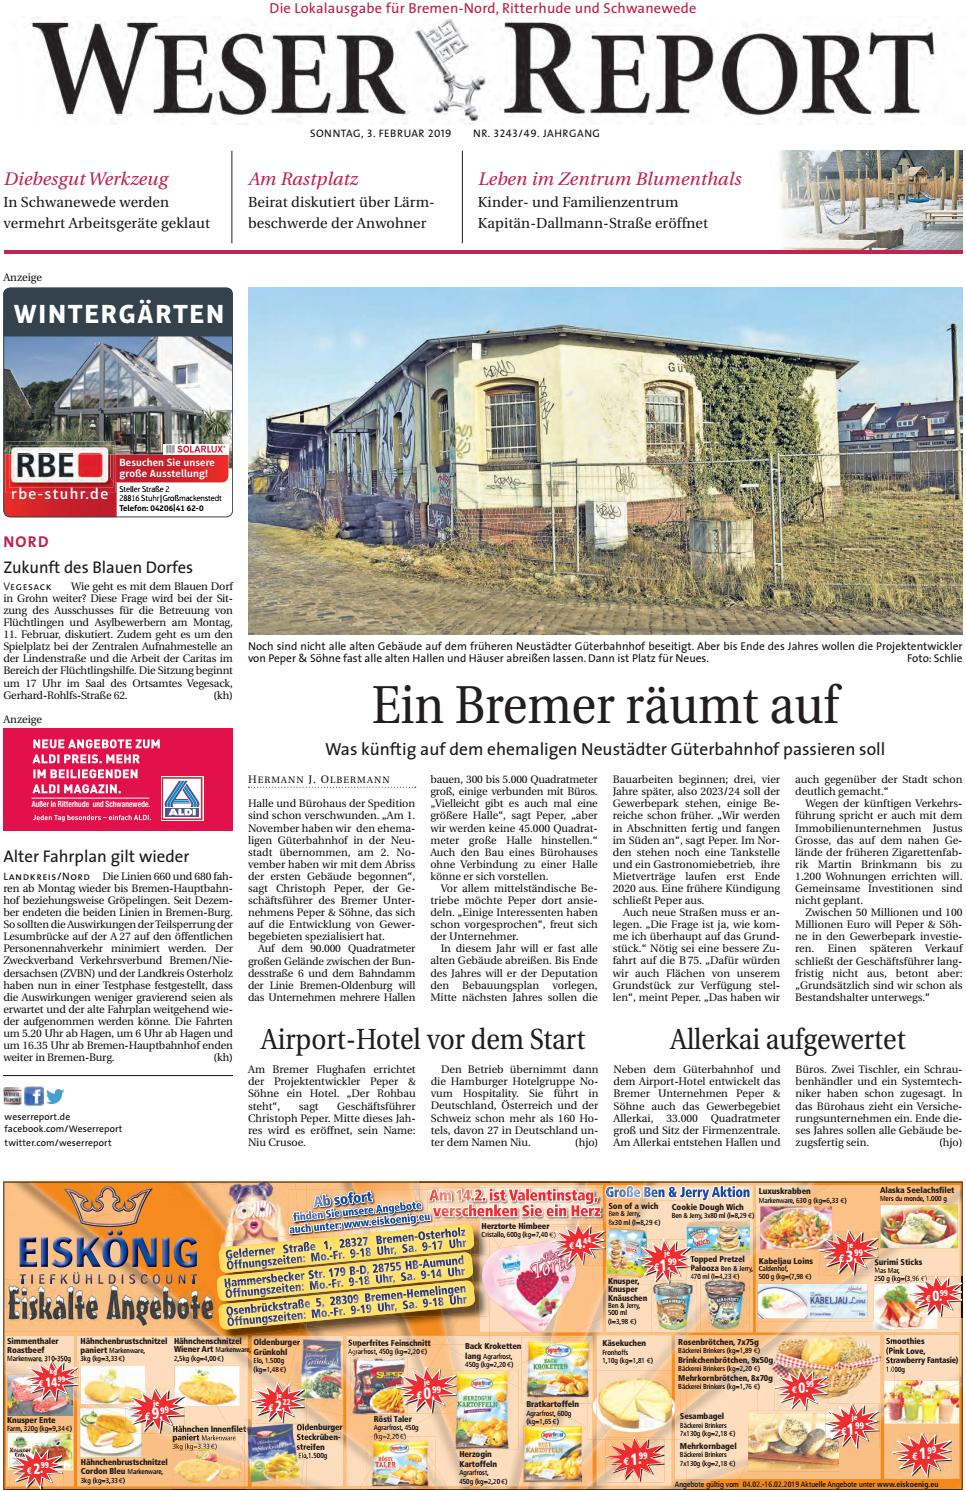 Weser Report - Nord vom 03.02.2019 by KPS Verlagsgesellschaft mbH ...